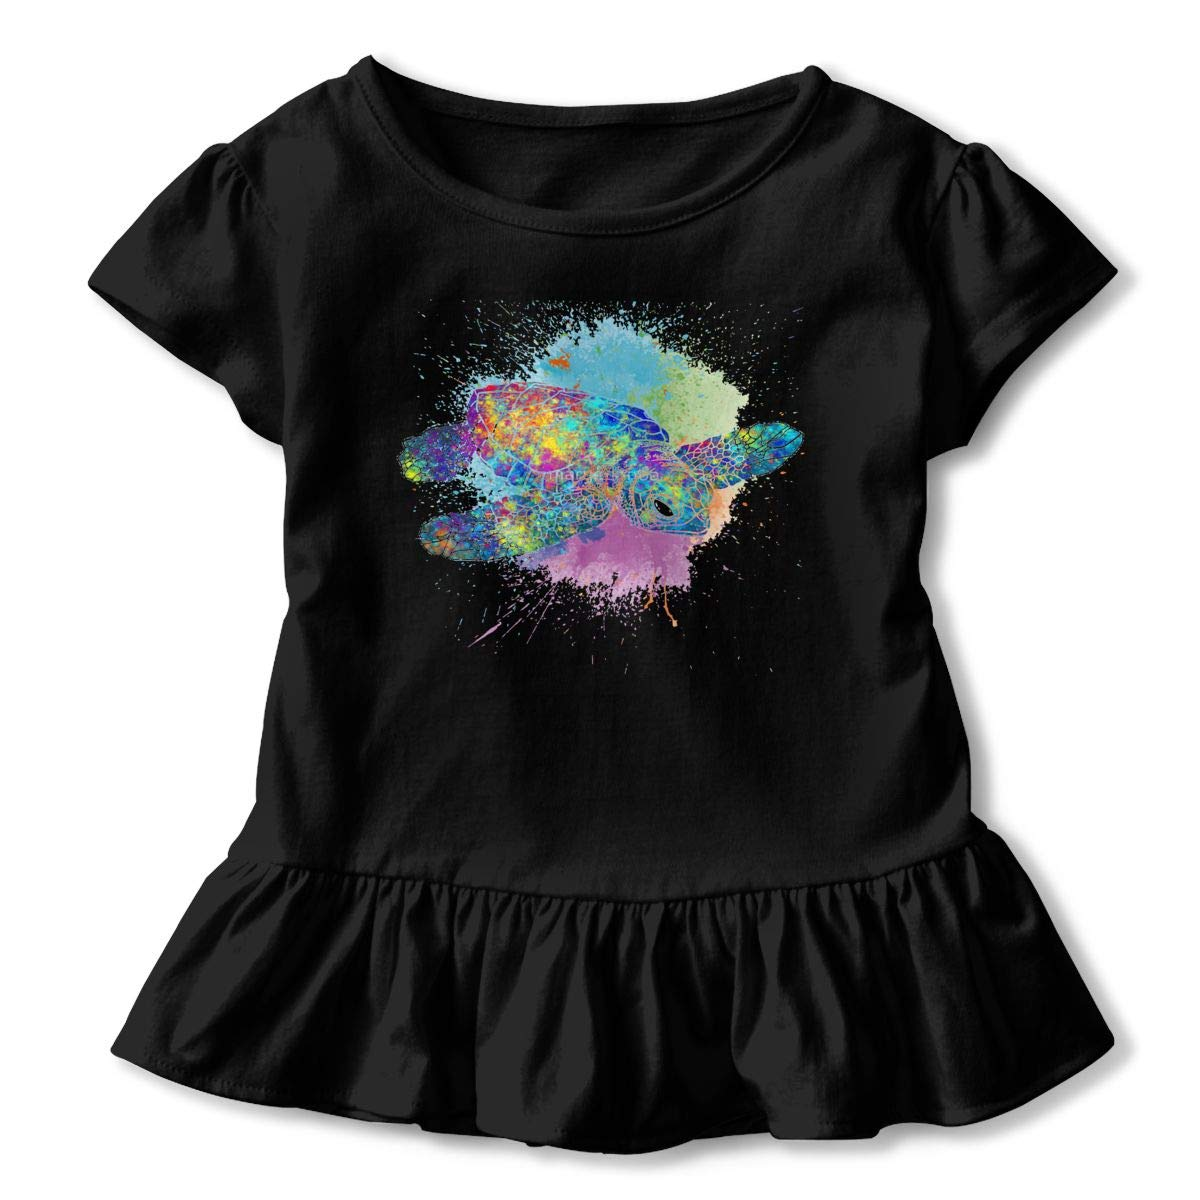 CZnuen Watercolor Splash Love Turtles 2-6T Baby Girls Cotton Jersey Short Sleeve Ruffle Tee